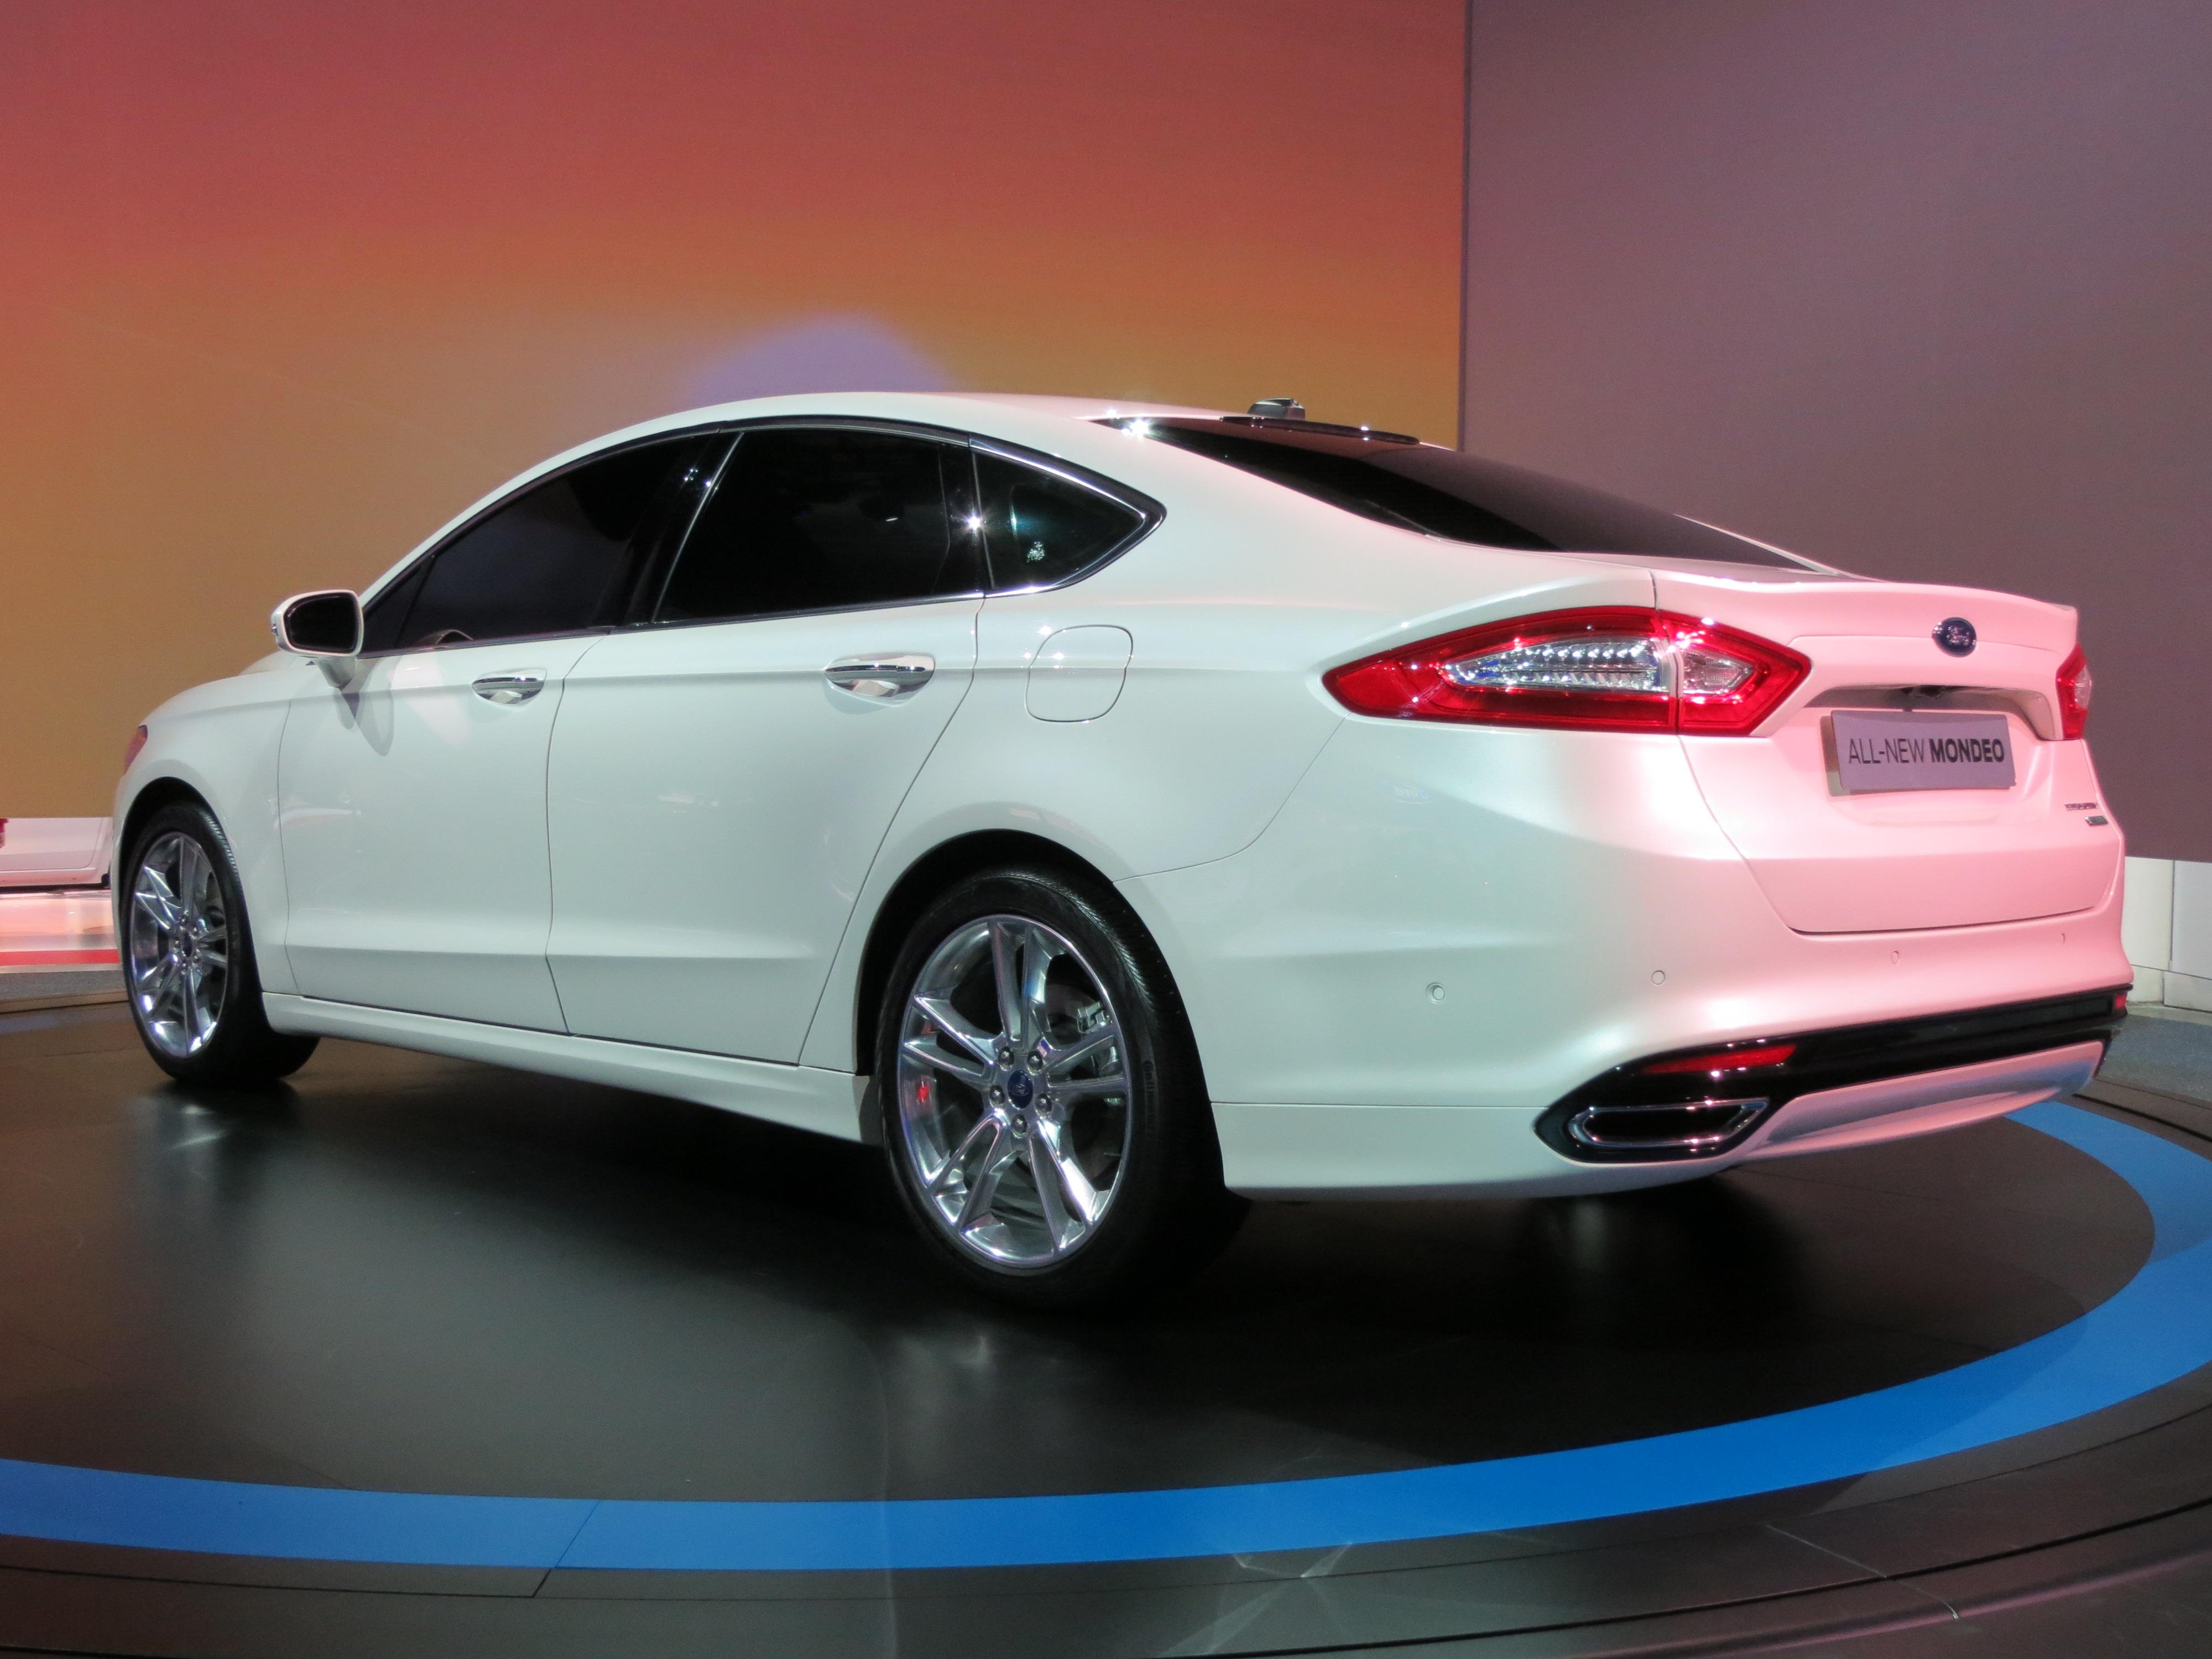 Ford Mondeo 2015 White >> File:2012 Ford Mondeo Titanium sedan (2012-10-26) 06.jpg